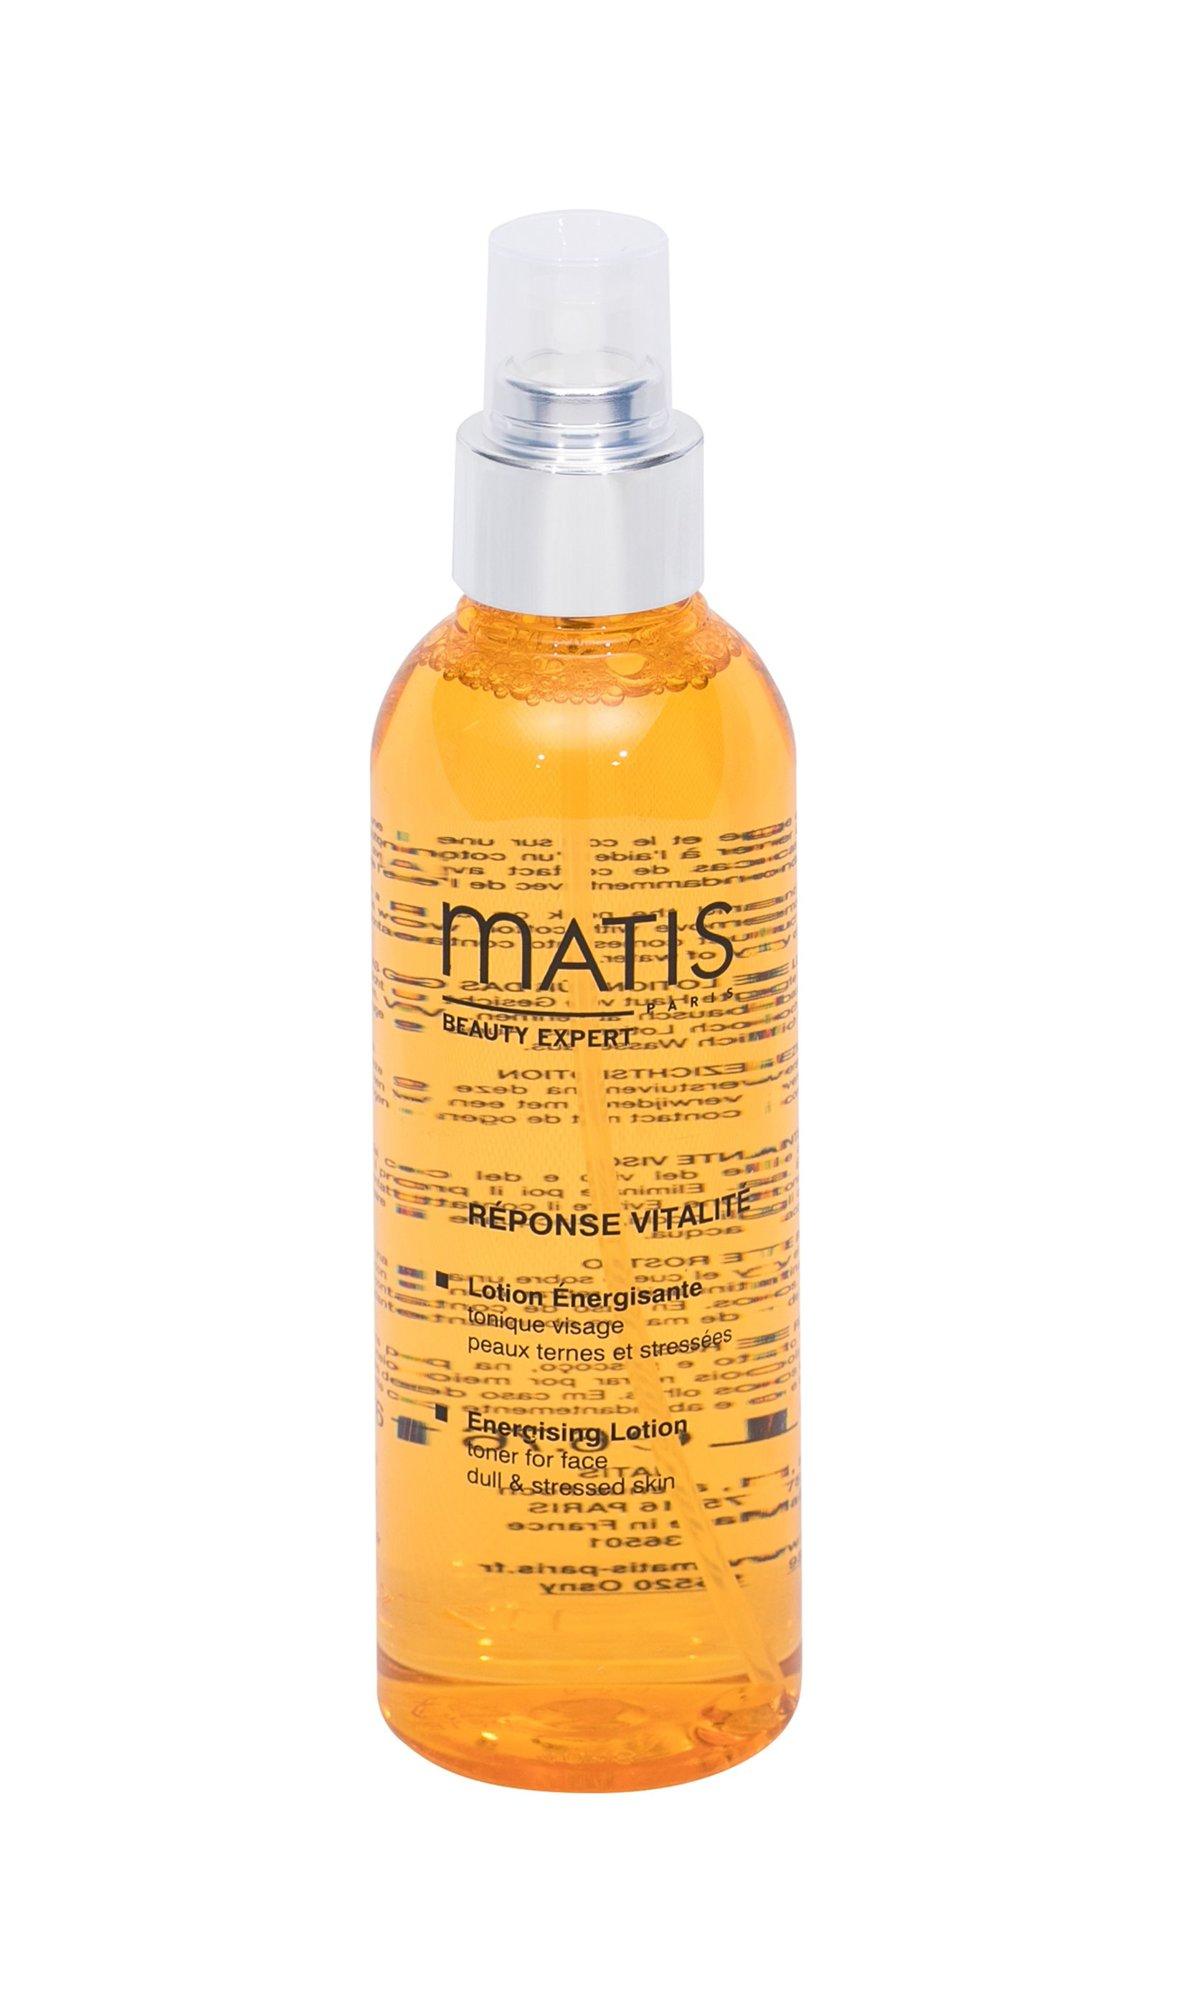 Matis Réponse Vitalité Cleansing Water 200ml  Energising Lotion